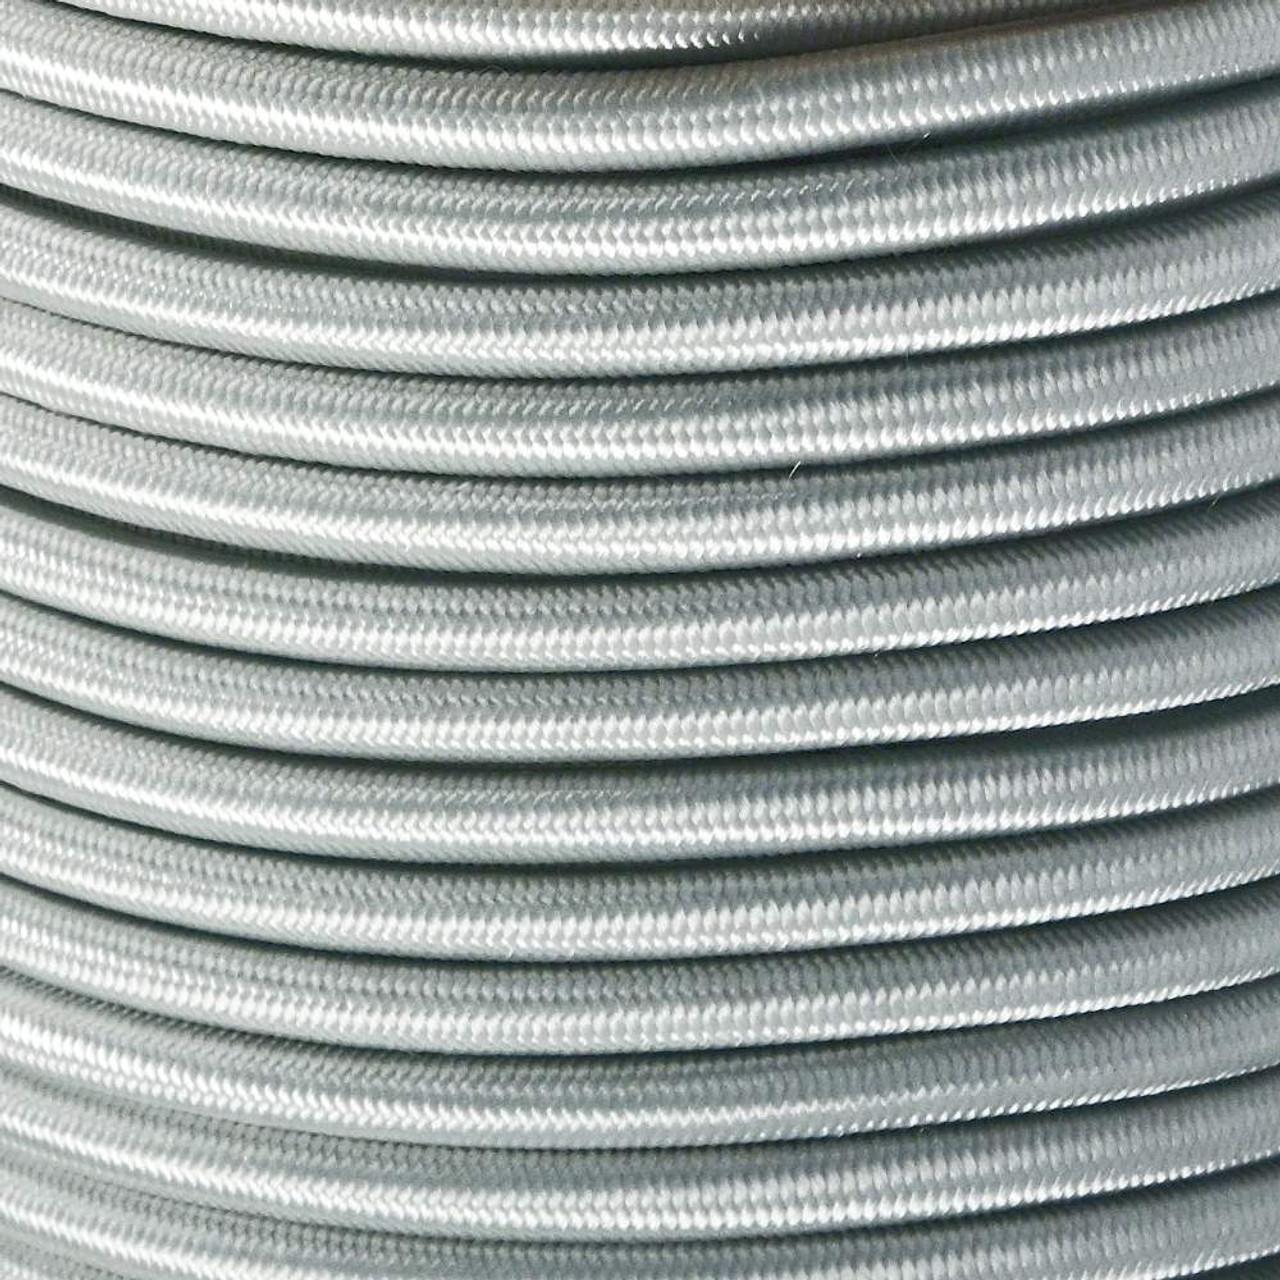 "Silver Gray Bungee Shock Stretch Cord 1 4"" Diameter"